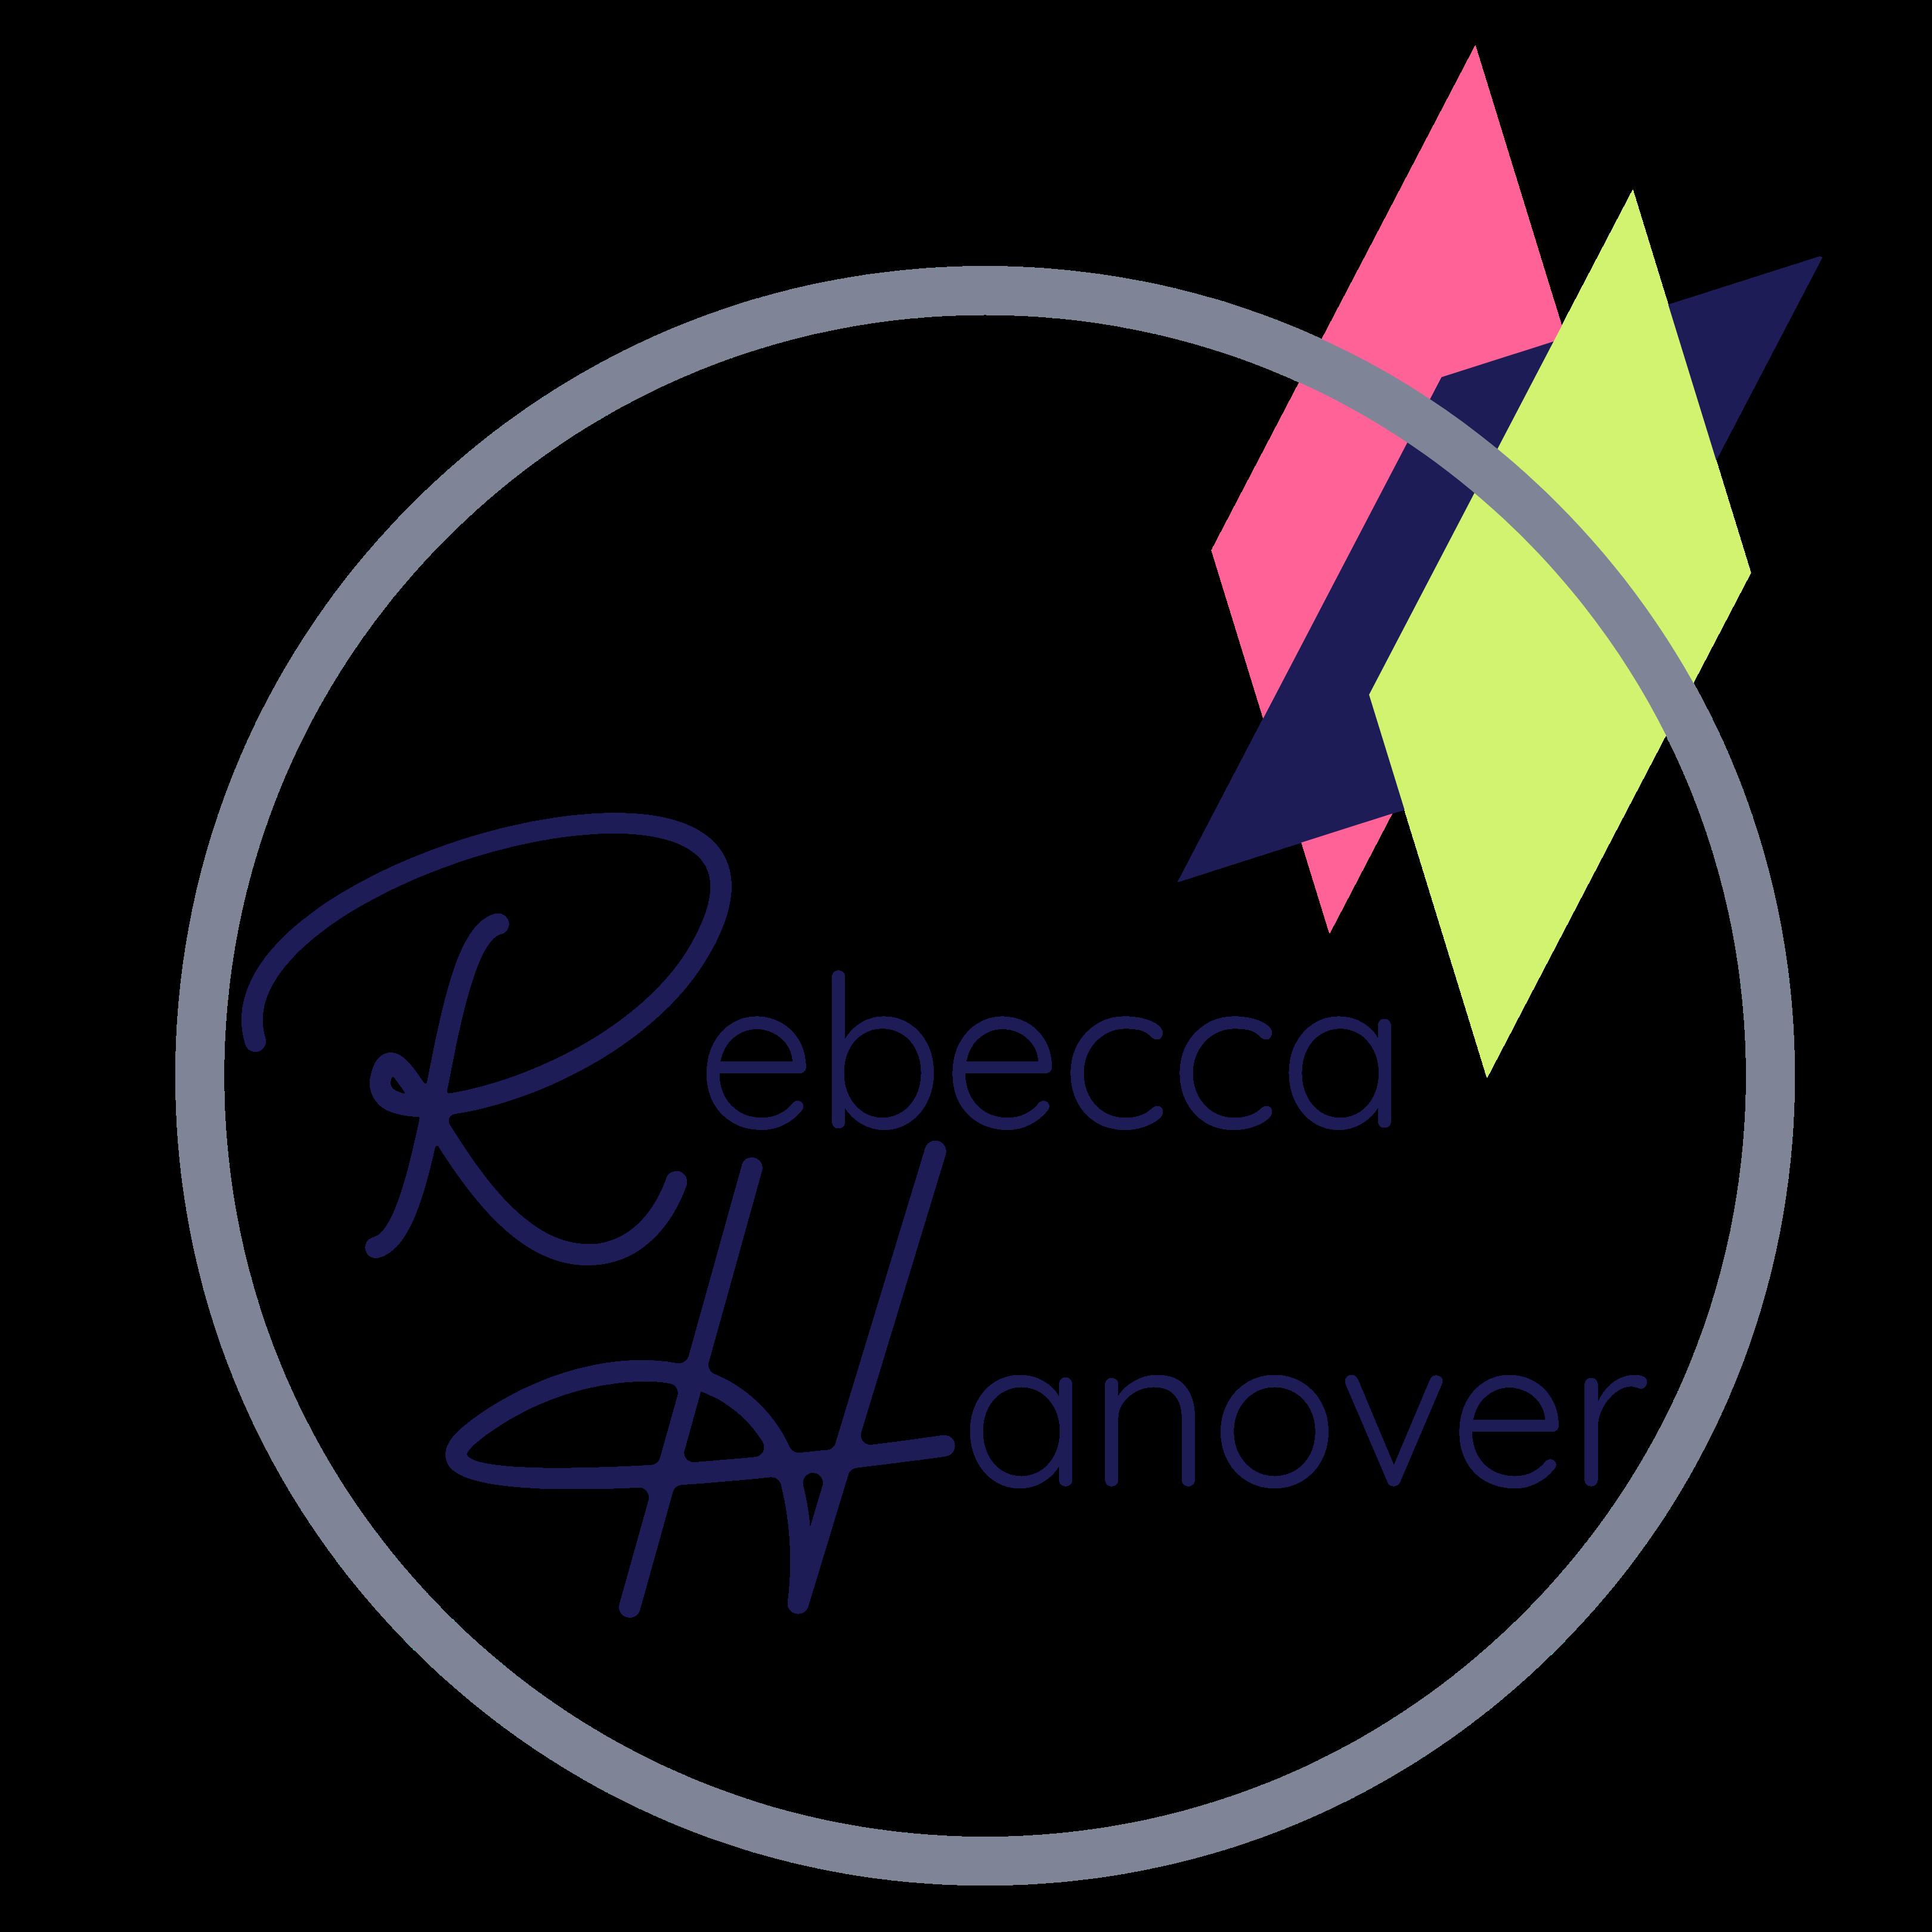 Rebecca Hanover